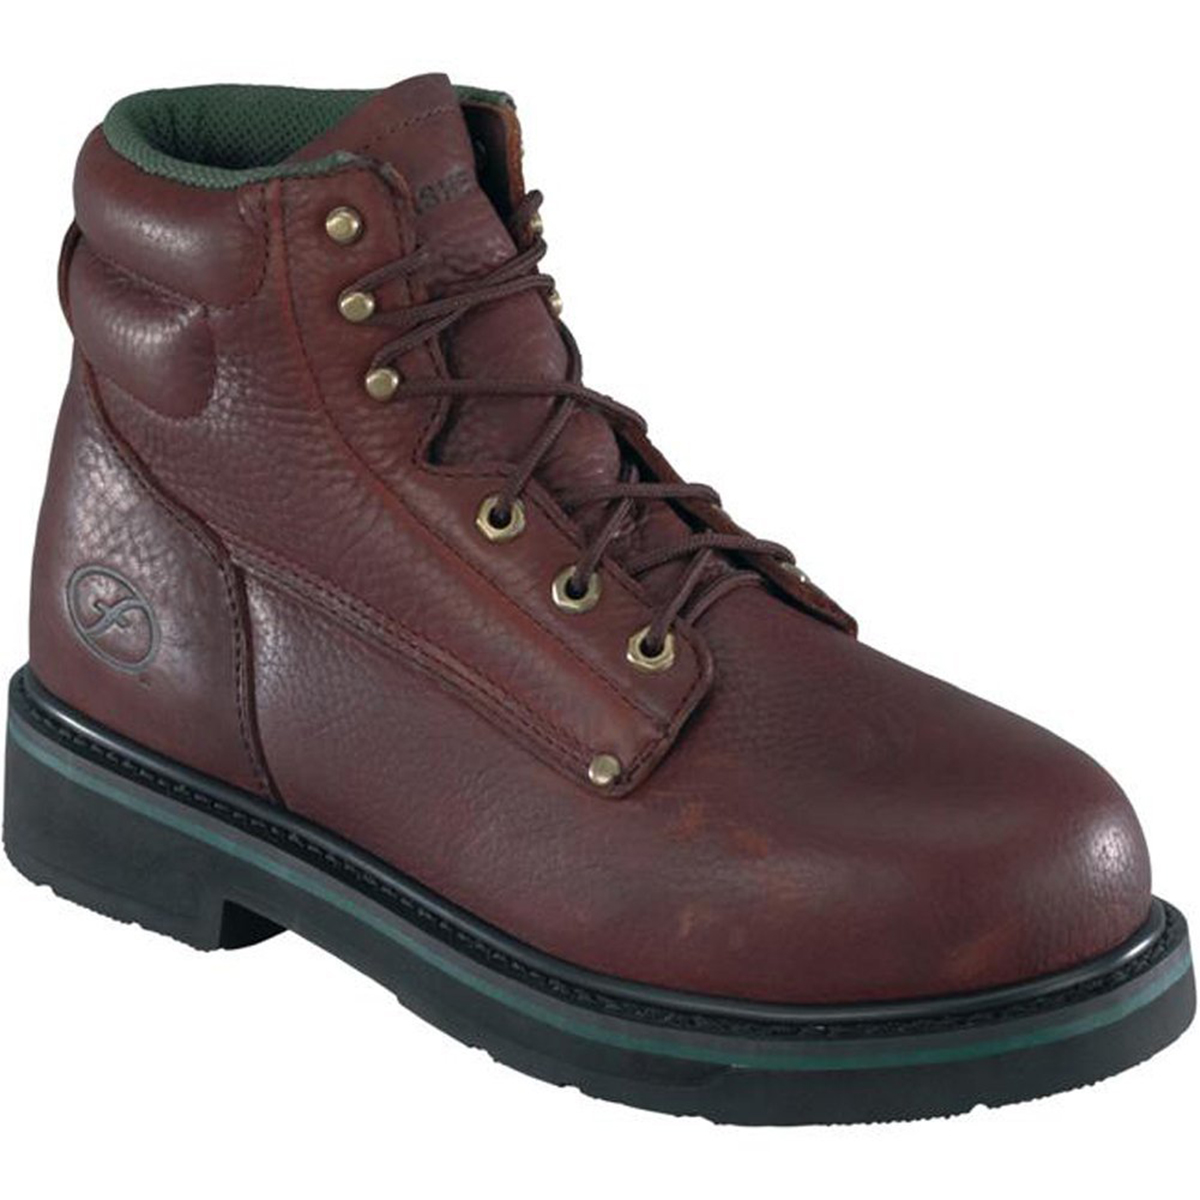 Florsheim Work Men's Utility Plain Toe 6'' Leather, Polyurethane Classic Boots